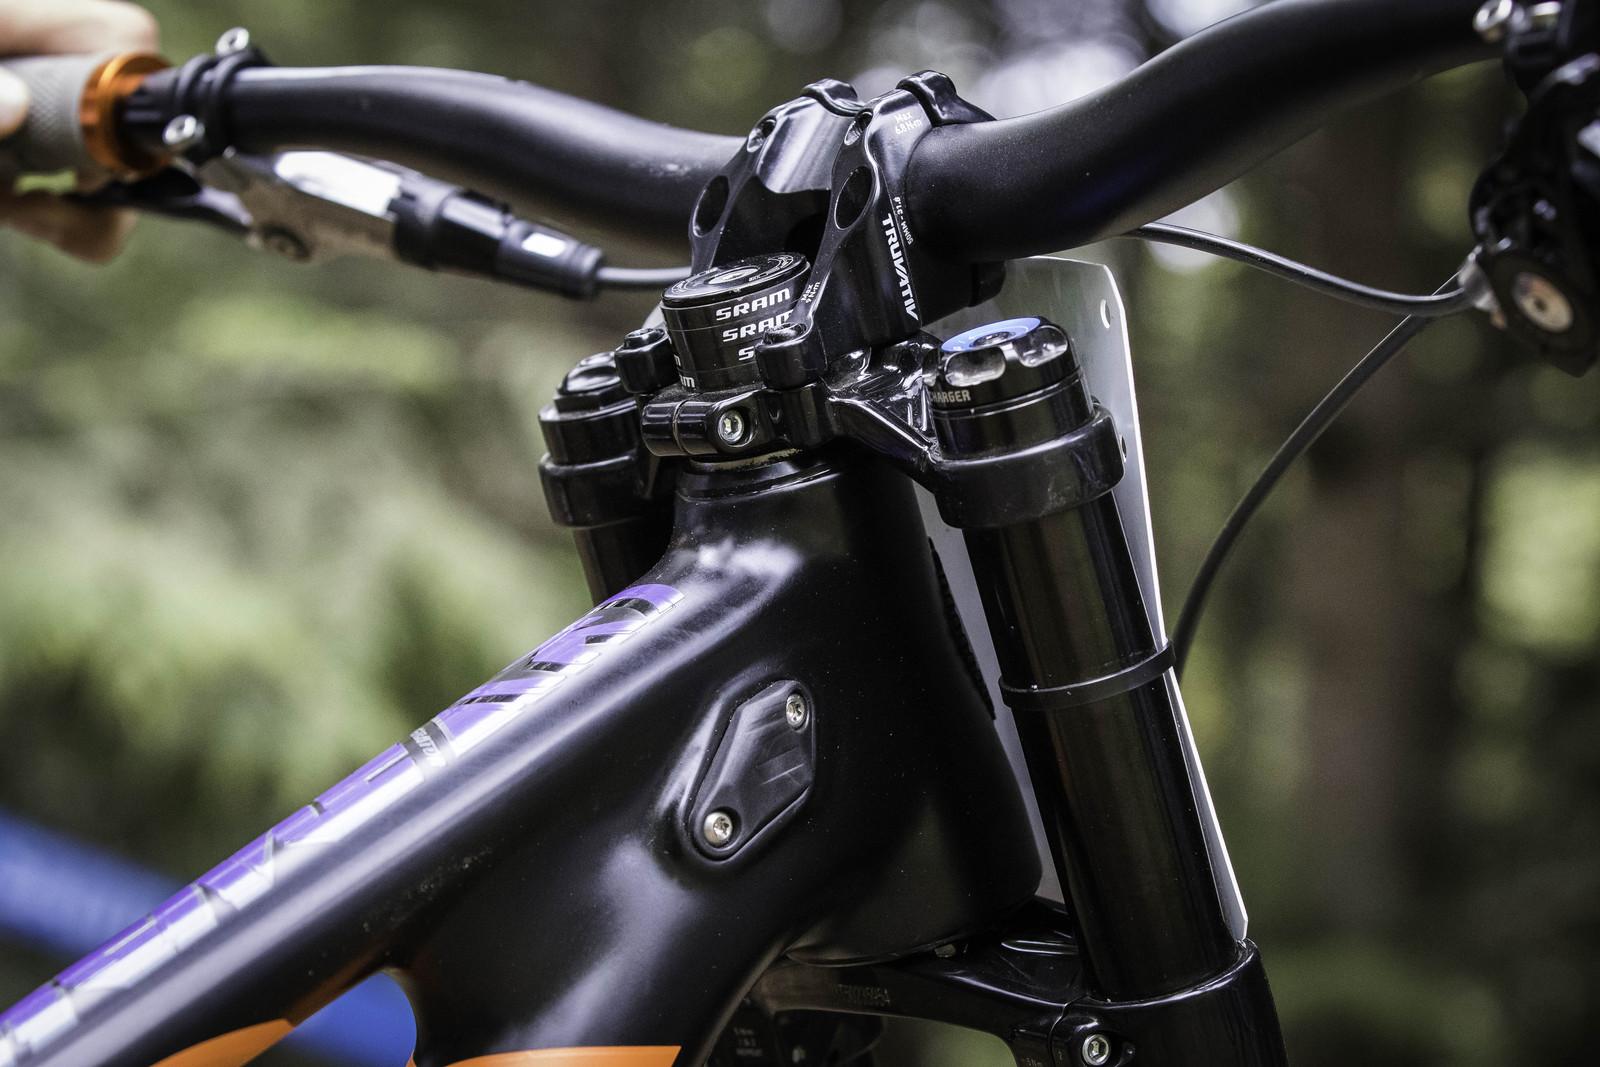 WINNING BIKE: Connor Fearon's Kona Supreme Operator 27.5 - WINNING BIKE: Connor Fearon's Kona Supreme Operator 27.5 - Mountain Biking Pictures - Vital MTB